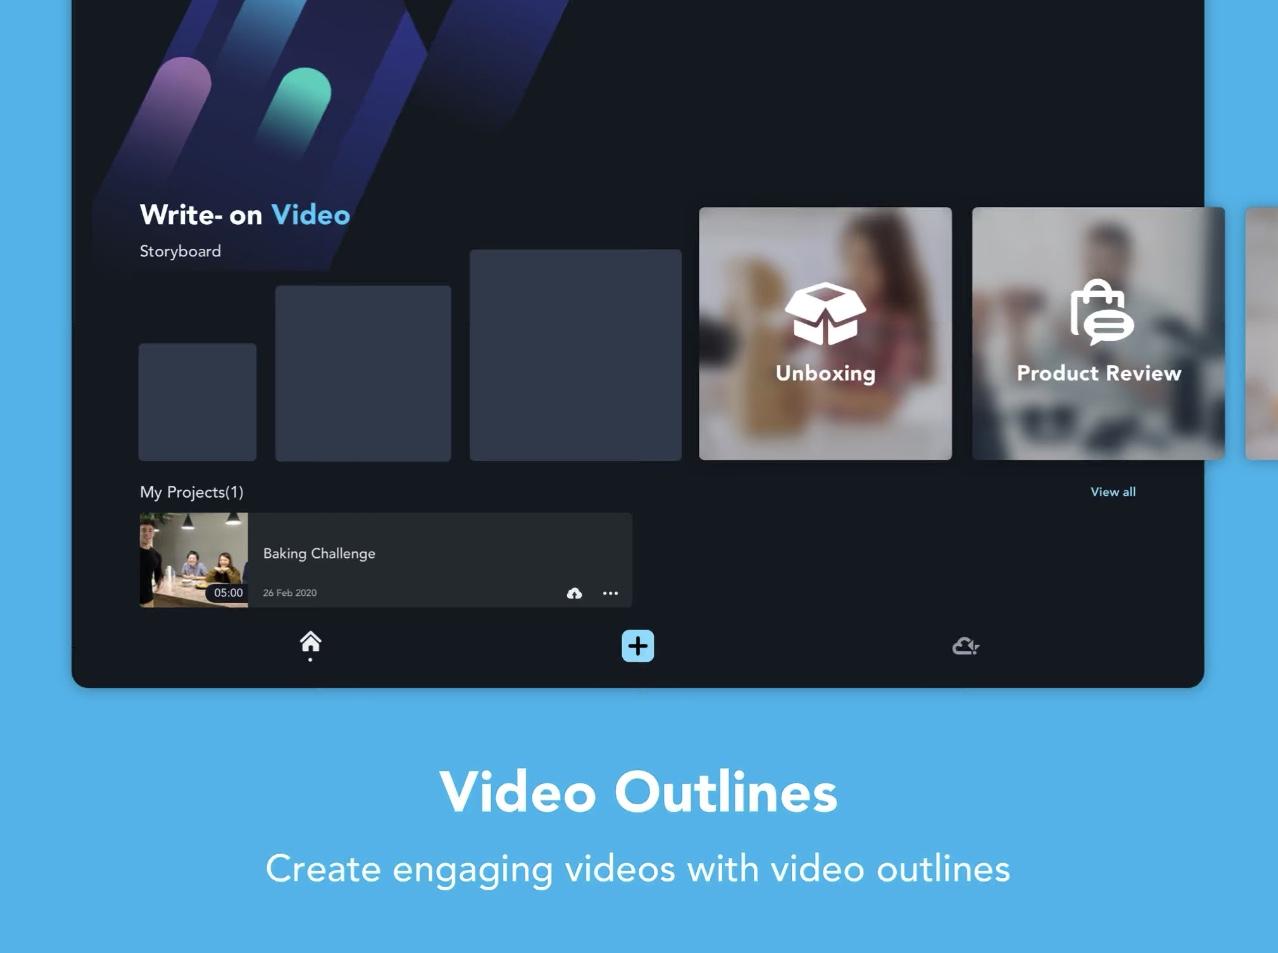 Write-on Video